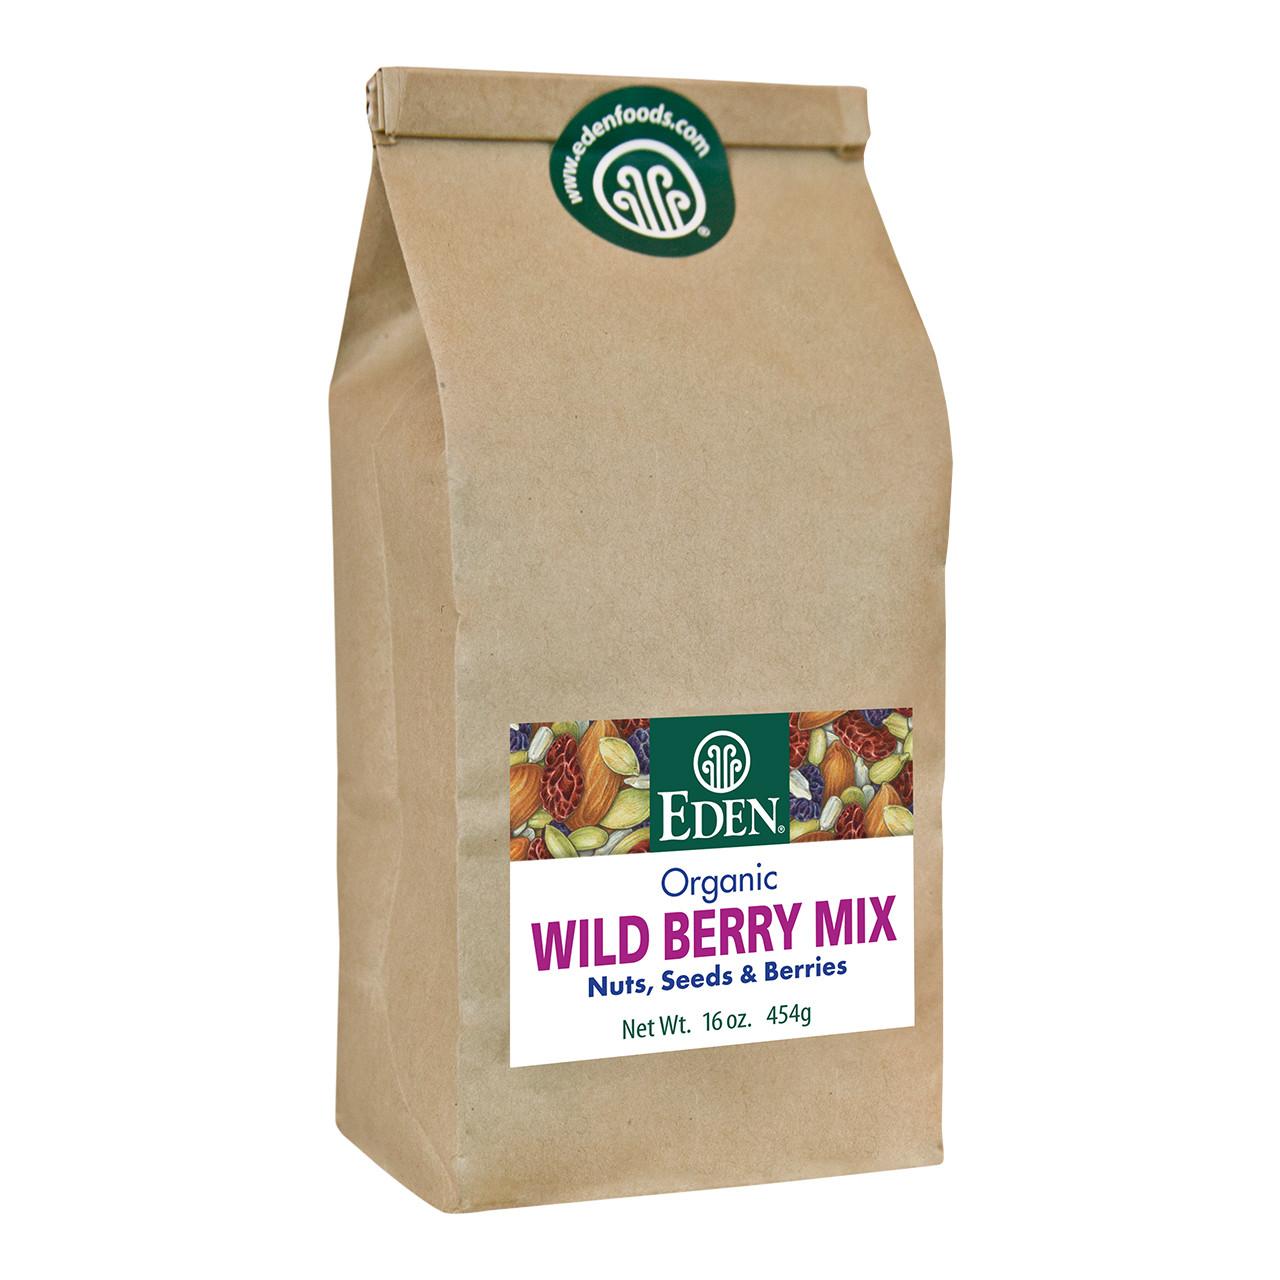 Wild Berry Mix, Organic - 1 lb